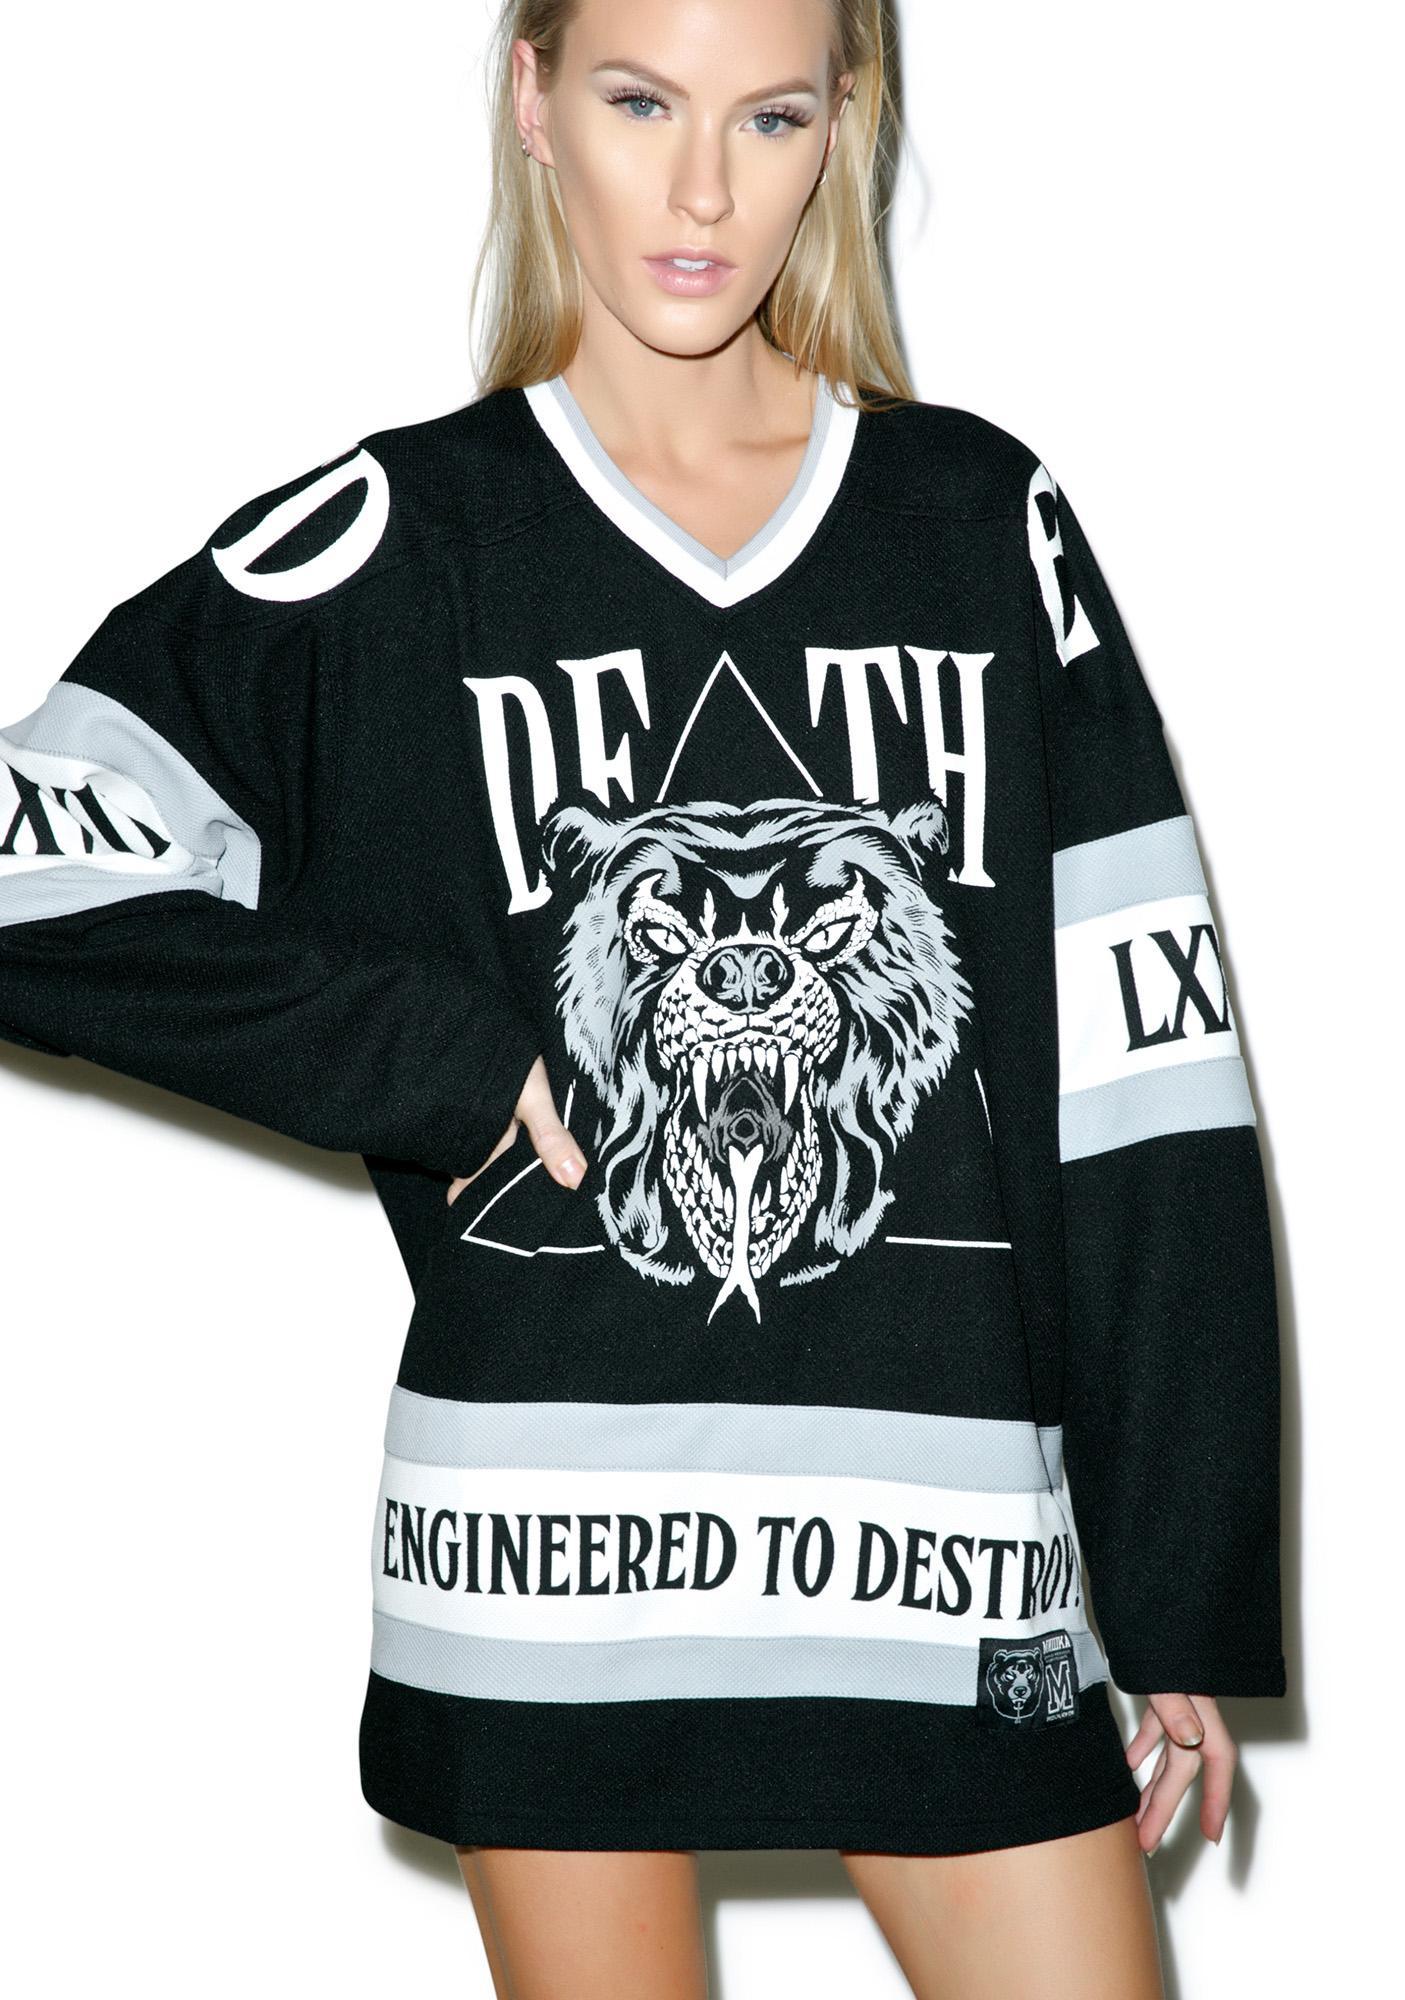 Mishka Lamour Supreme Death Adder Hockey Jersey